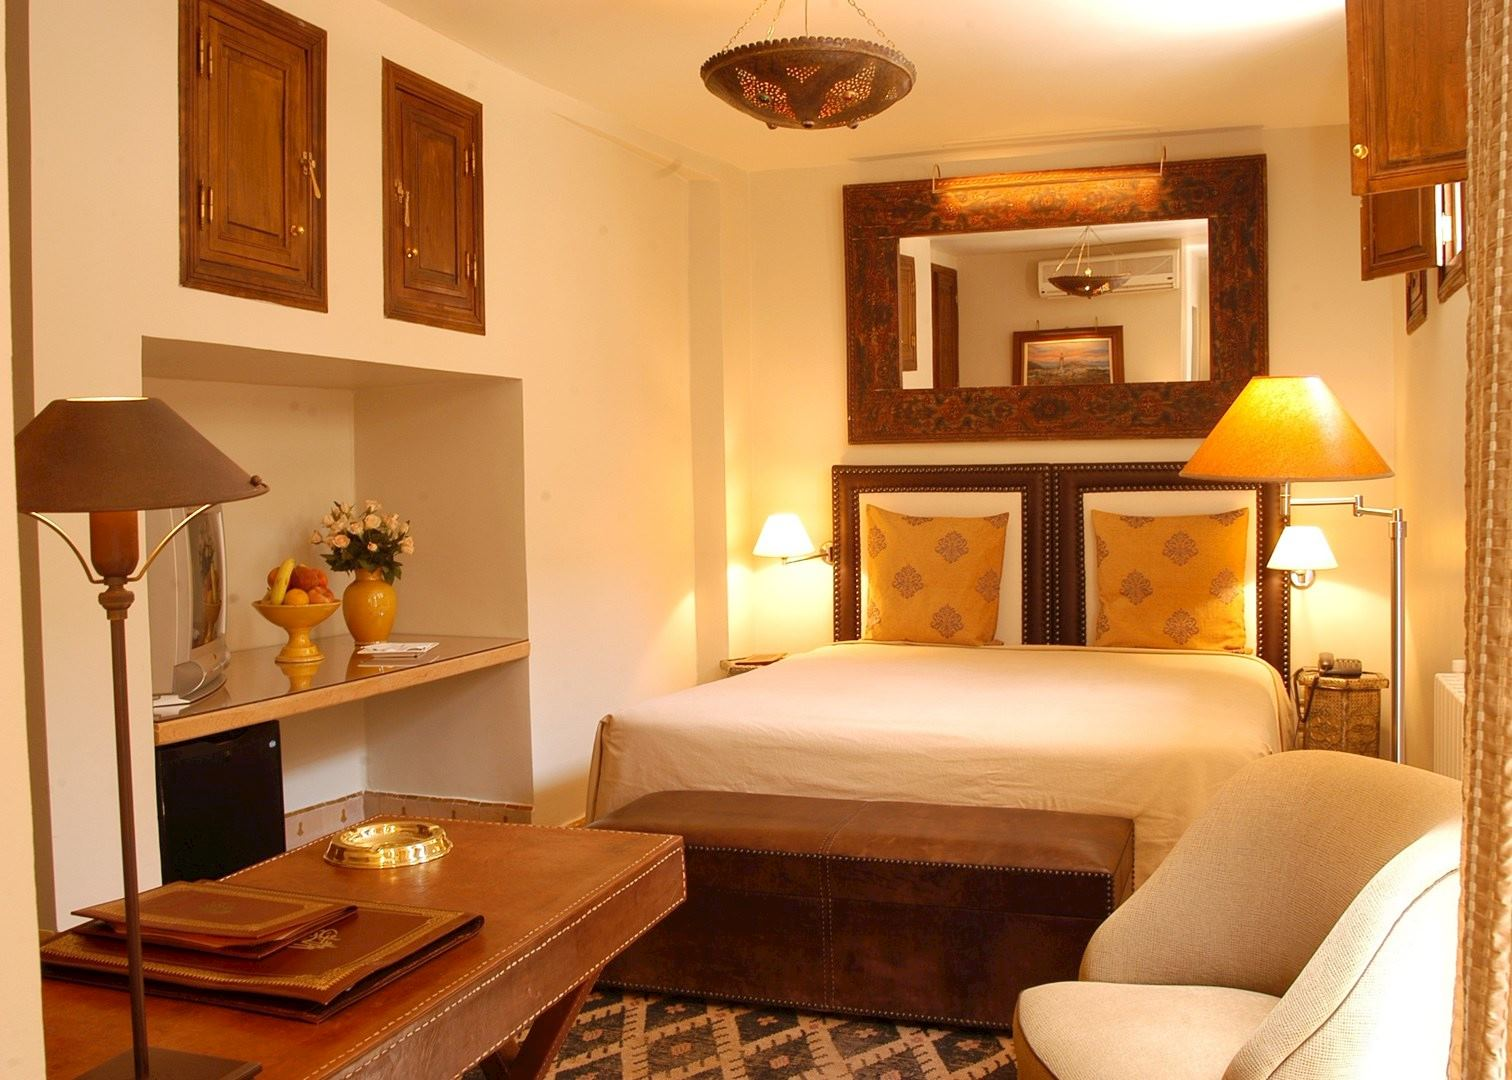 La maison arabe hotels in marrakesh audley travel - A la maison en arabe ...